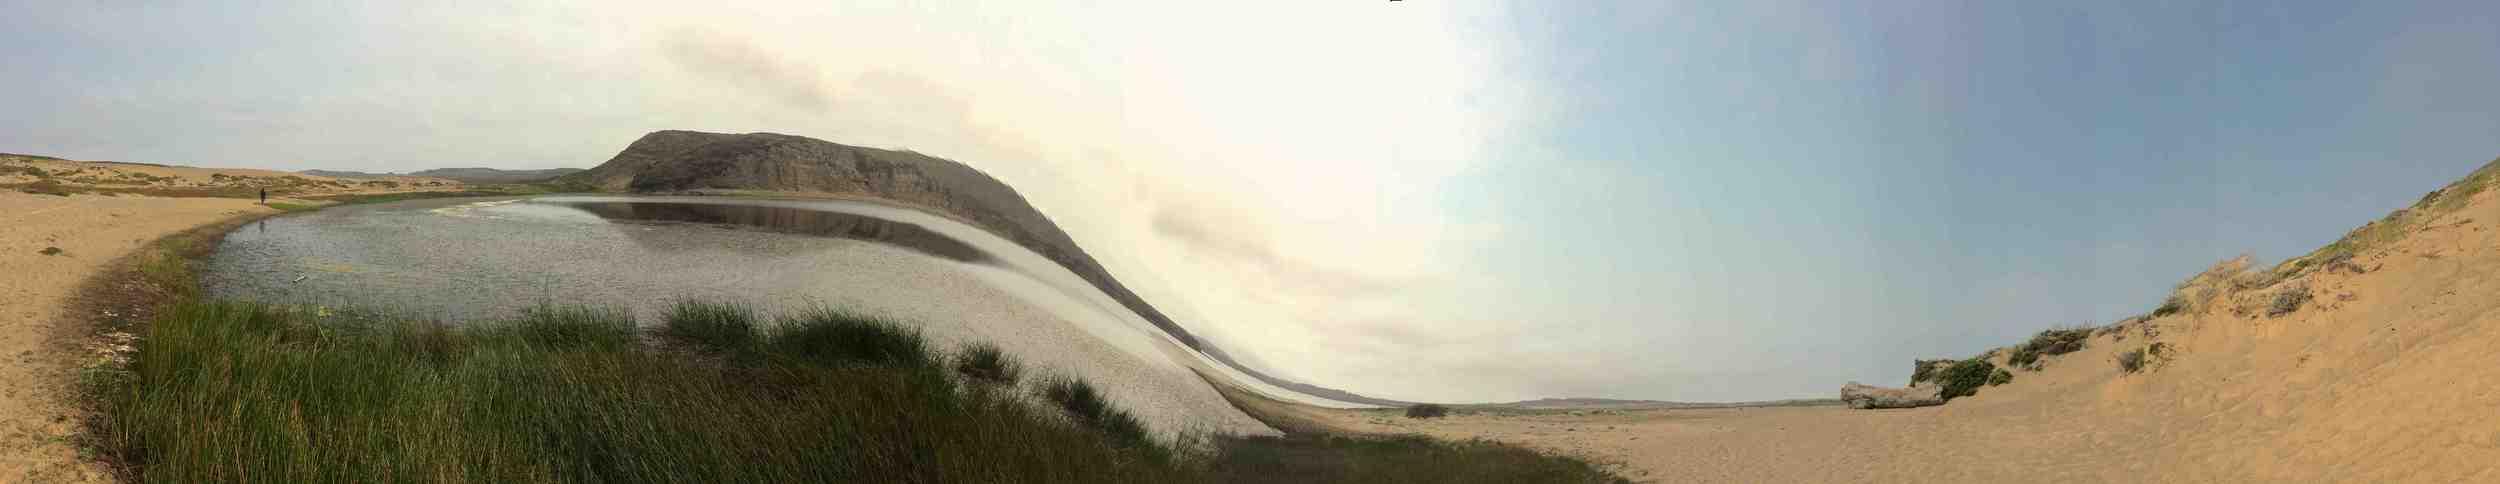 Abbotts Lagoon,13Sep15_7 Photograph; Copyright © Tennyson Woodbridge, 1963 to present